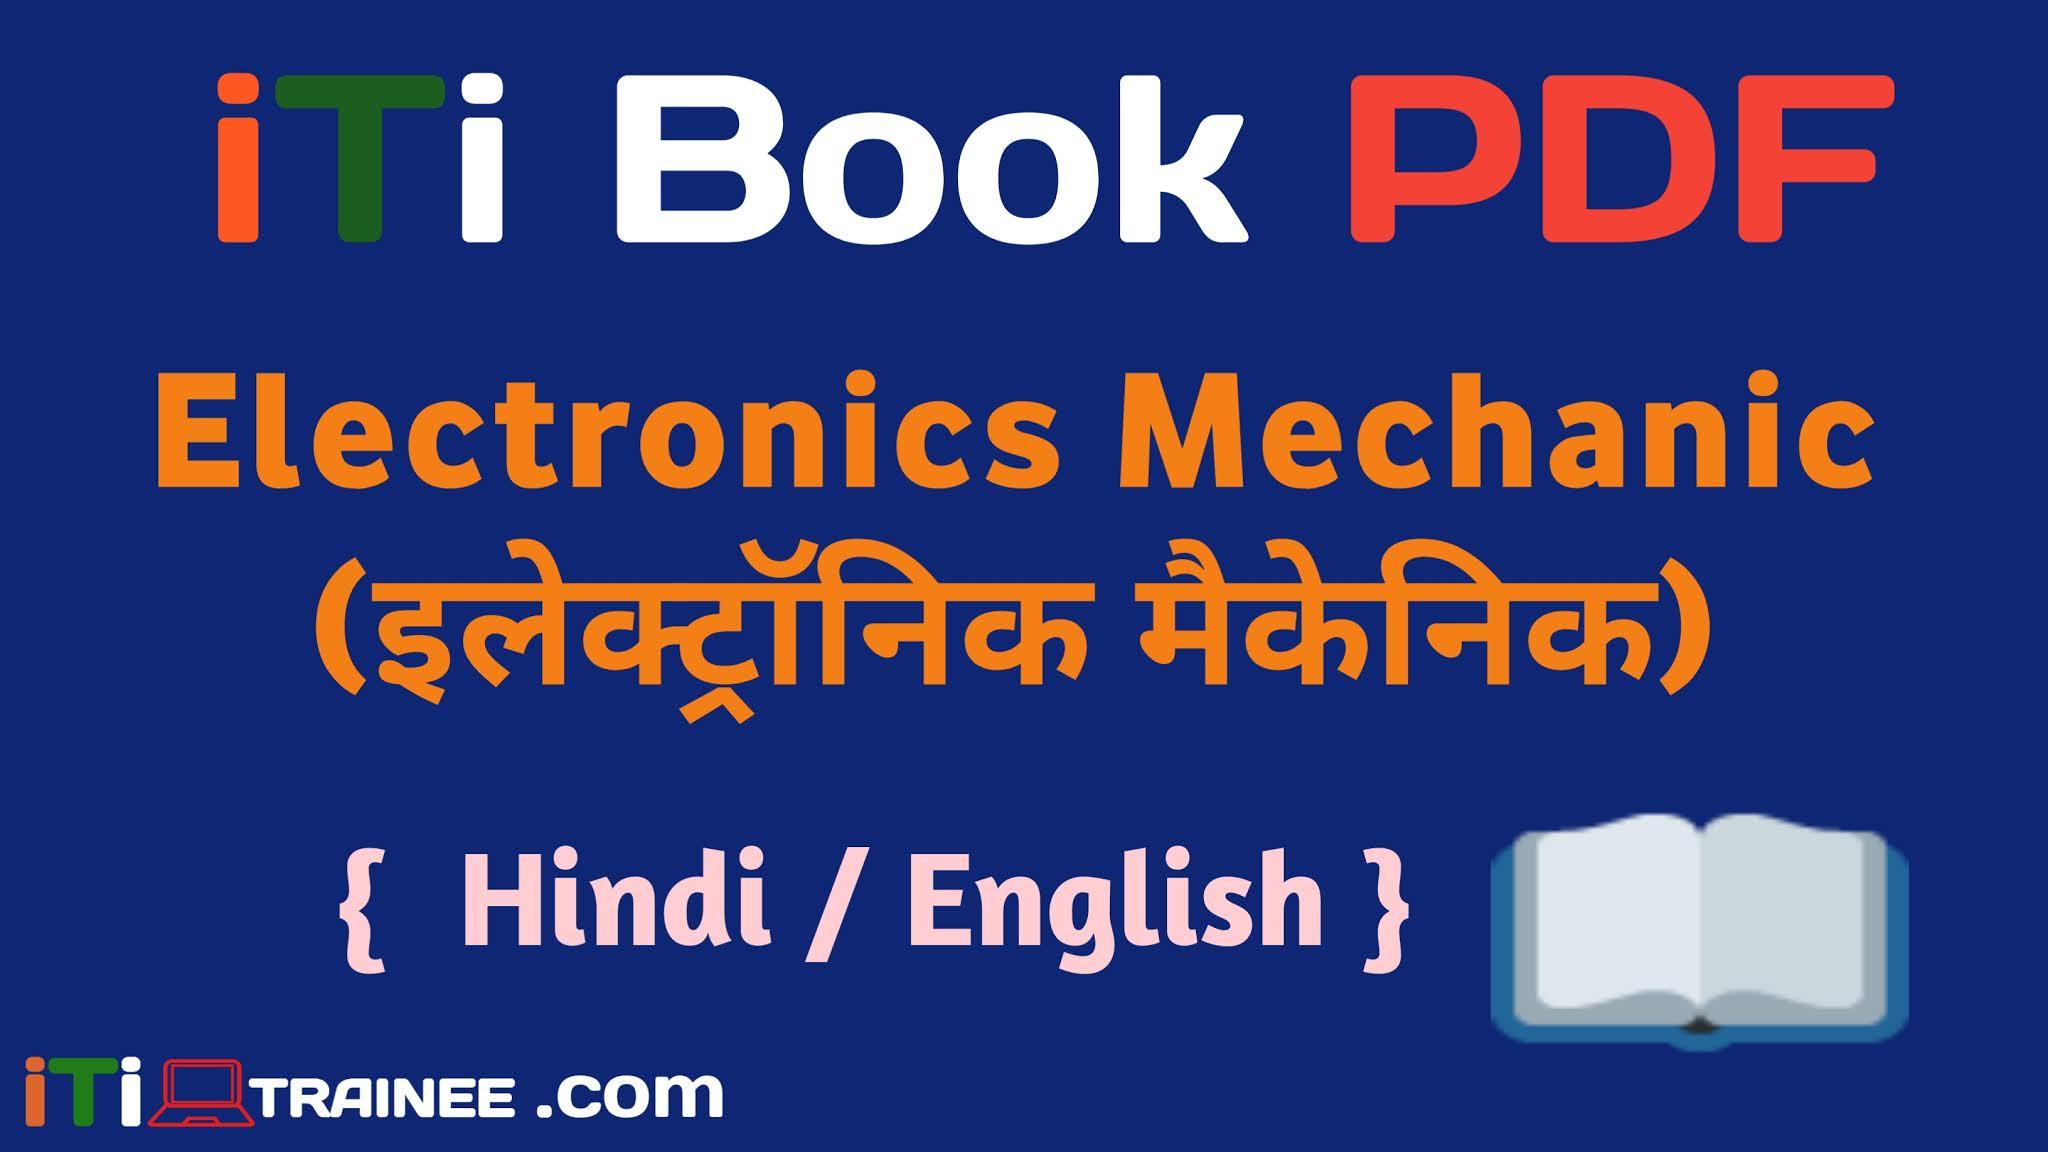 ITI Electronics Mechanic BOOK PDF Download